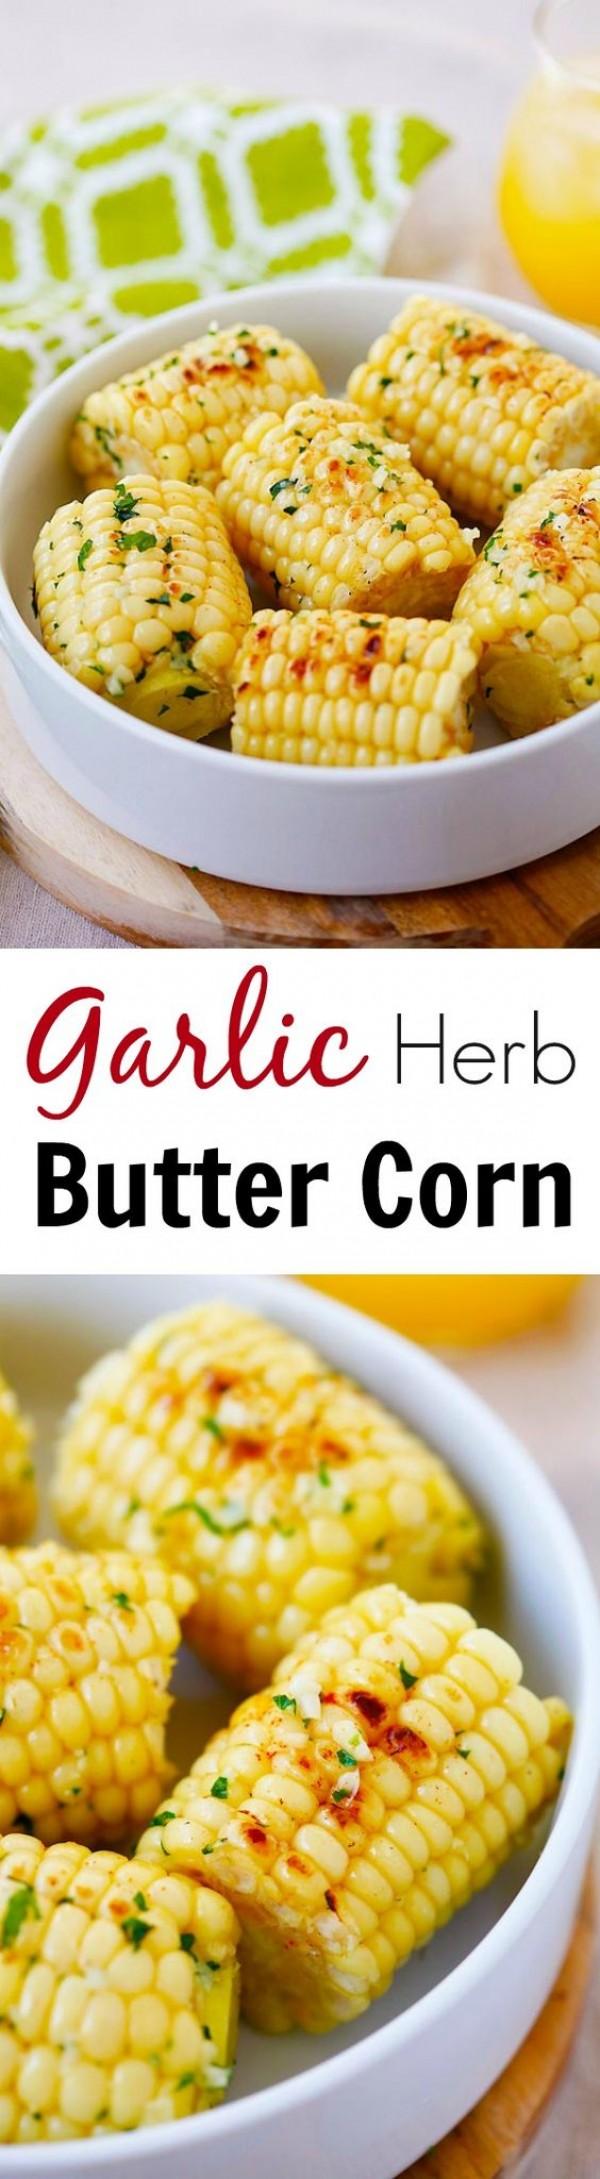 Get the recipe Garlic Herbs Butter Corn @recipes_to_go